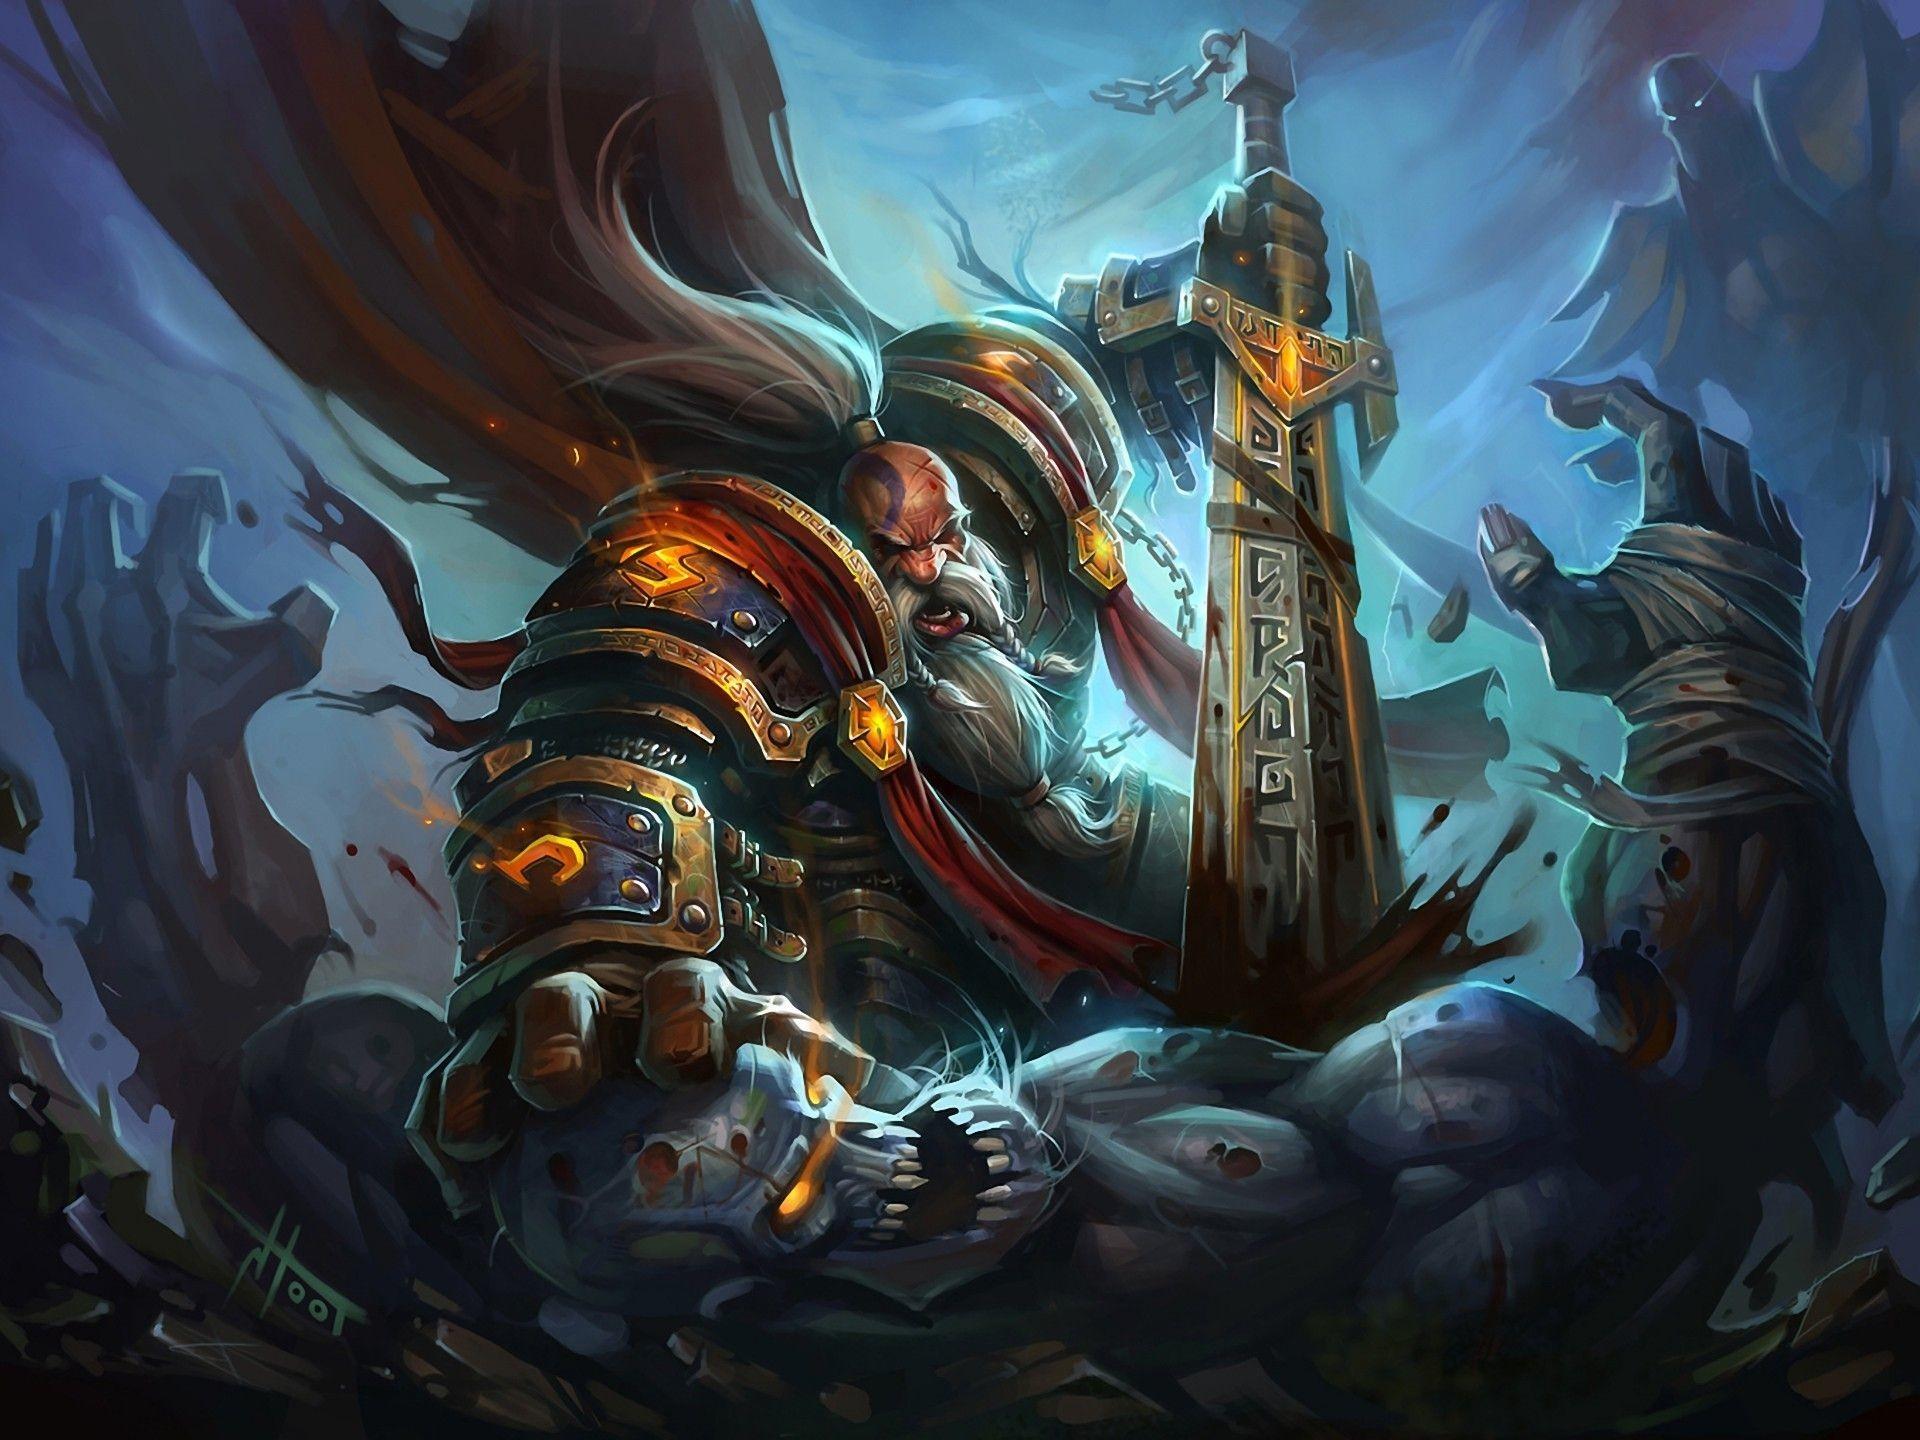 Res: 1920x1440, World Of Warcraft Wallpaper Paladin wallpaper 1920×1080 WOW Paladin  Wallpaper (44 Wallpapers) | Adorable Wallpapers